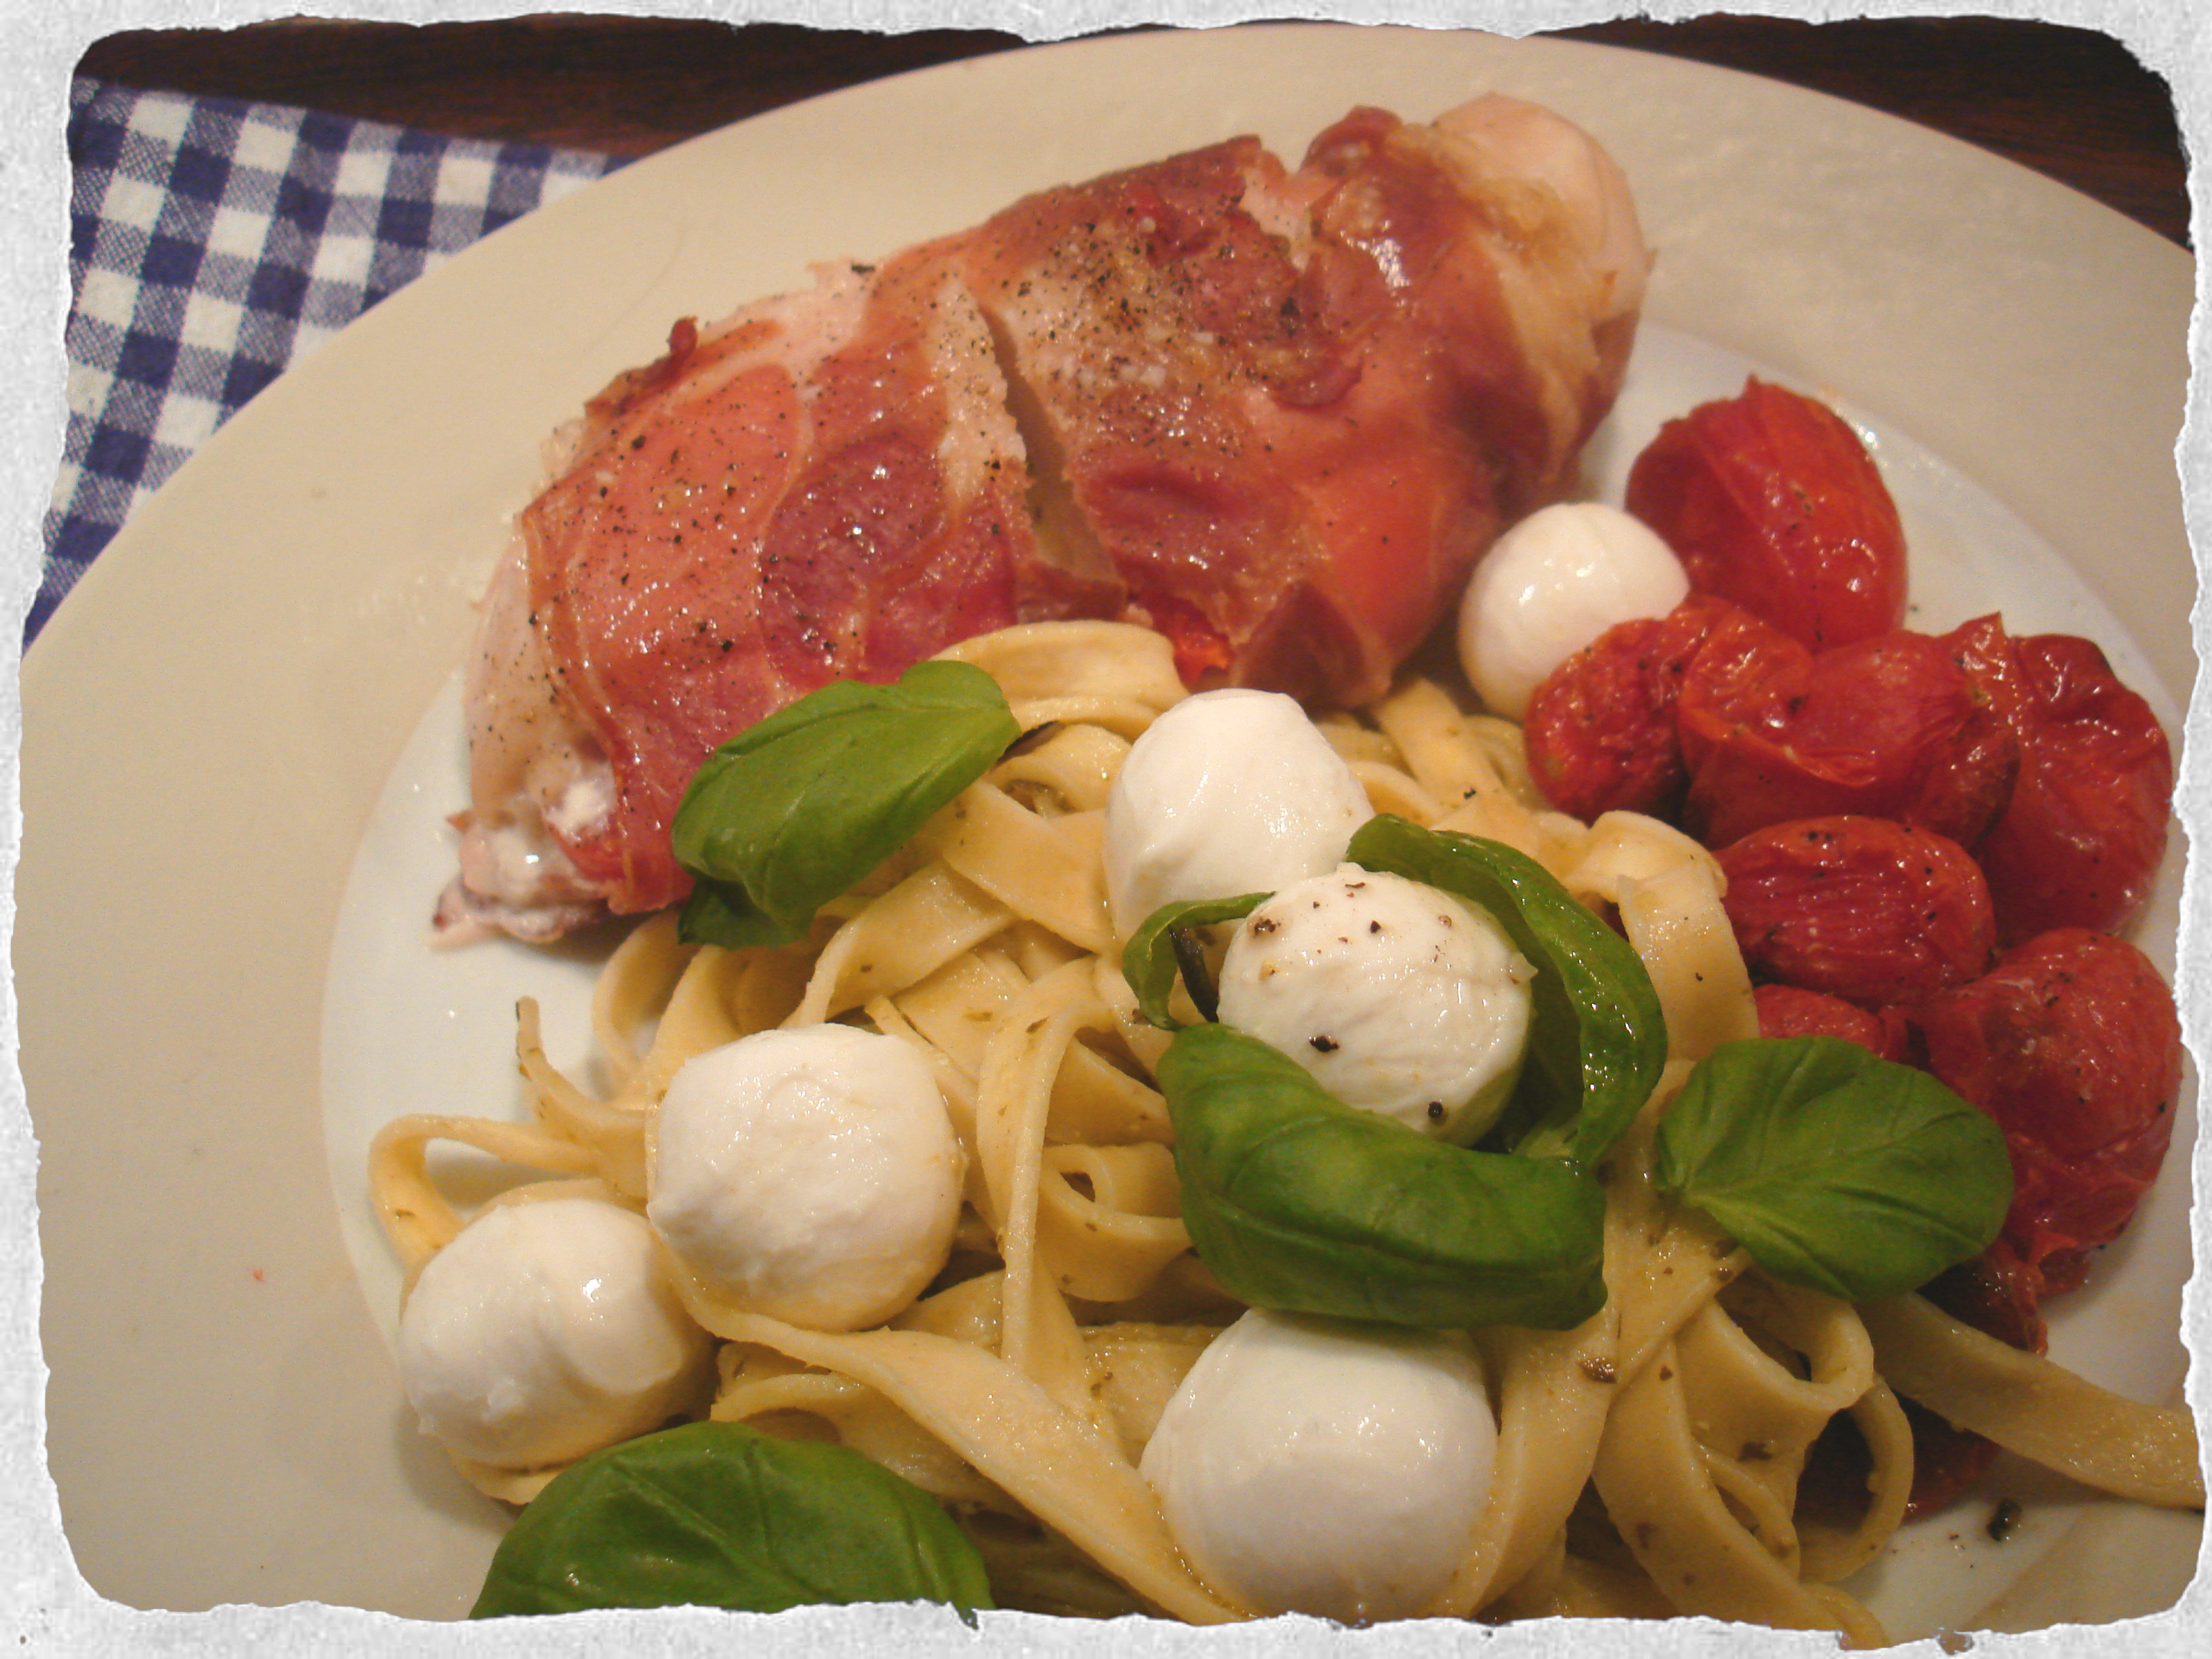 Caprese salad inspired dinner